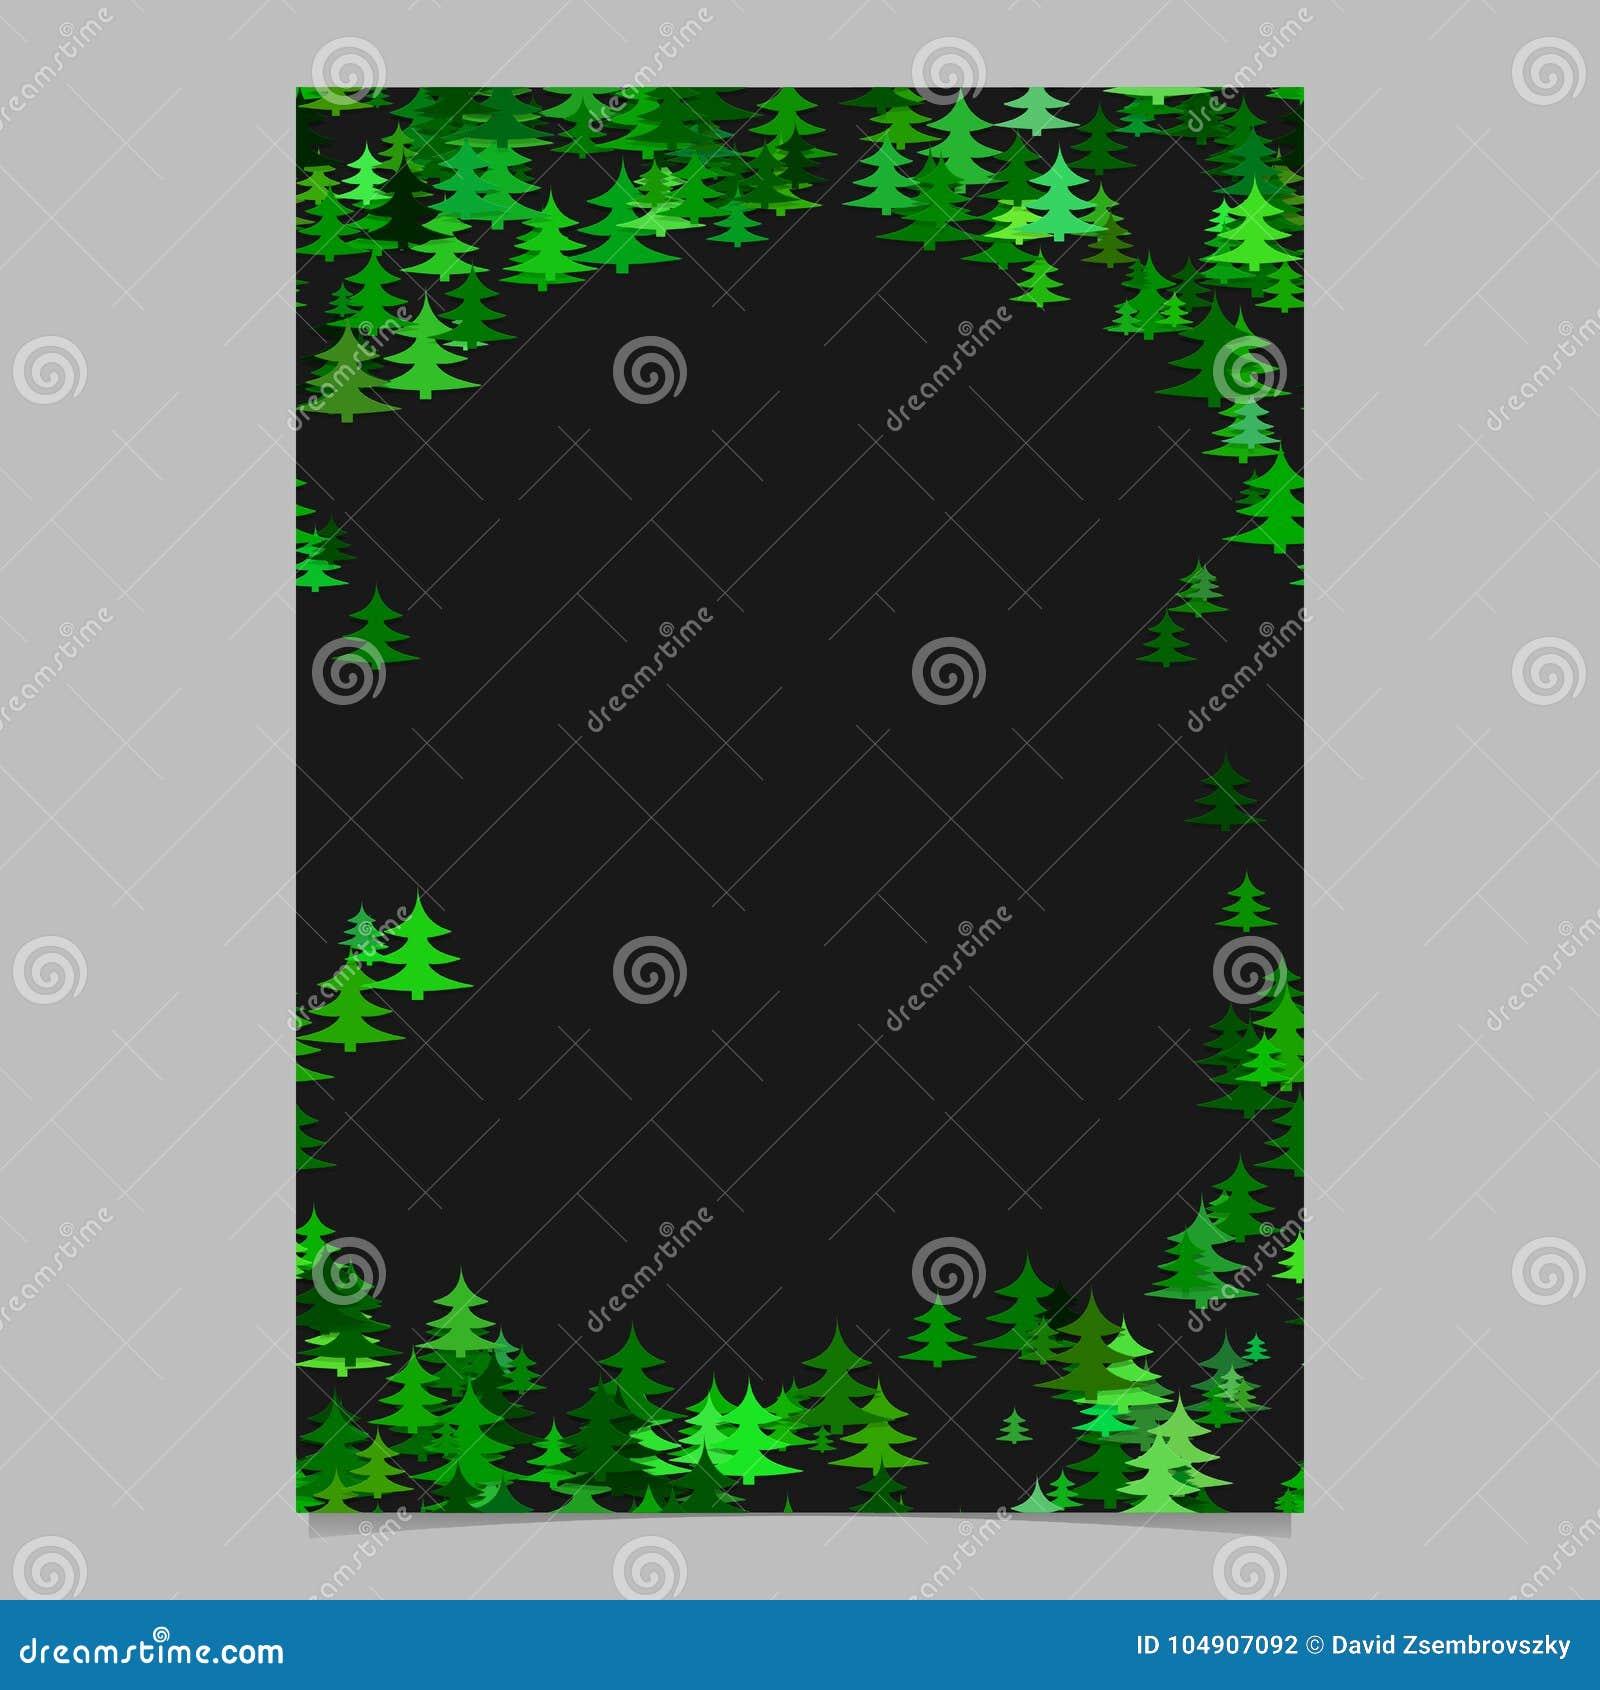 color random seasonal pine tree card template